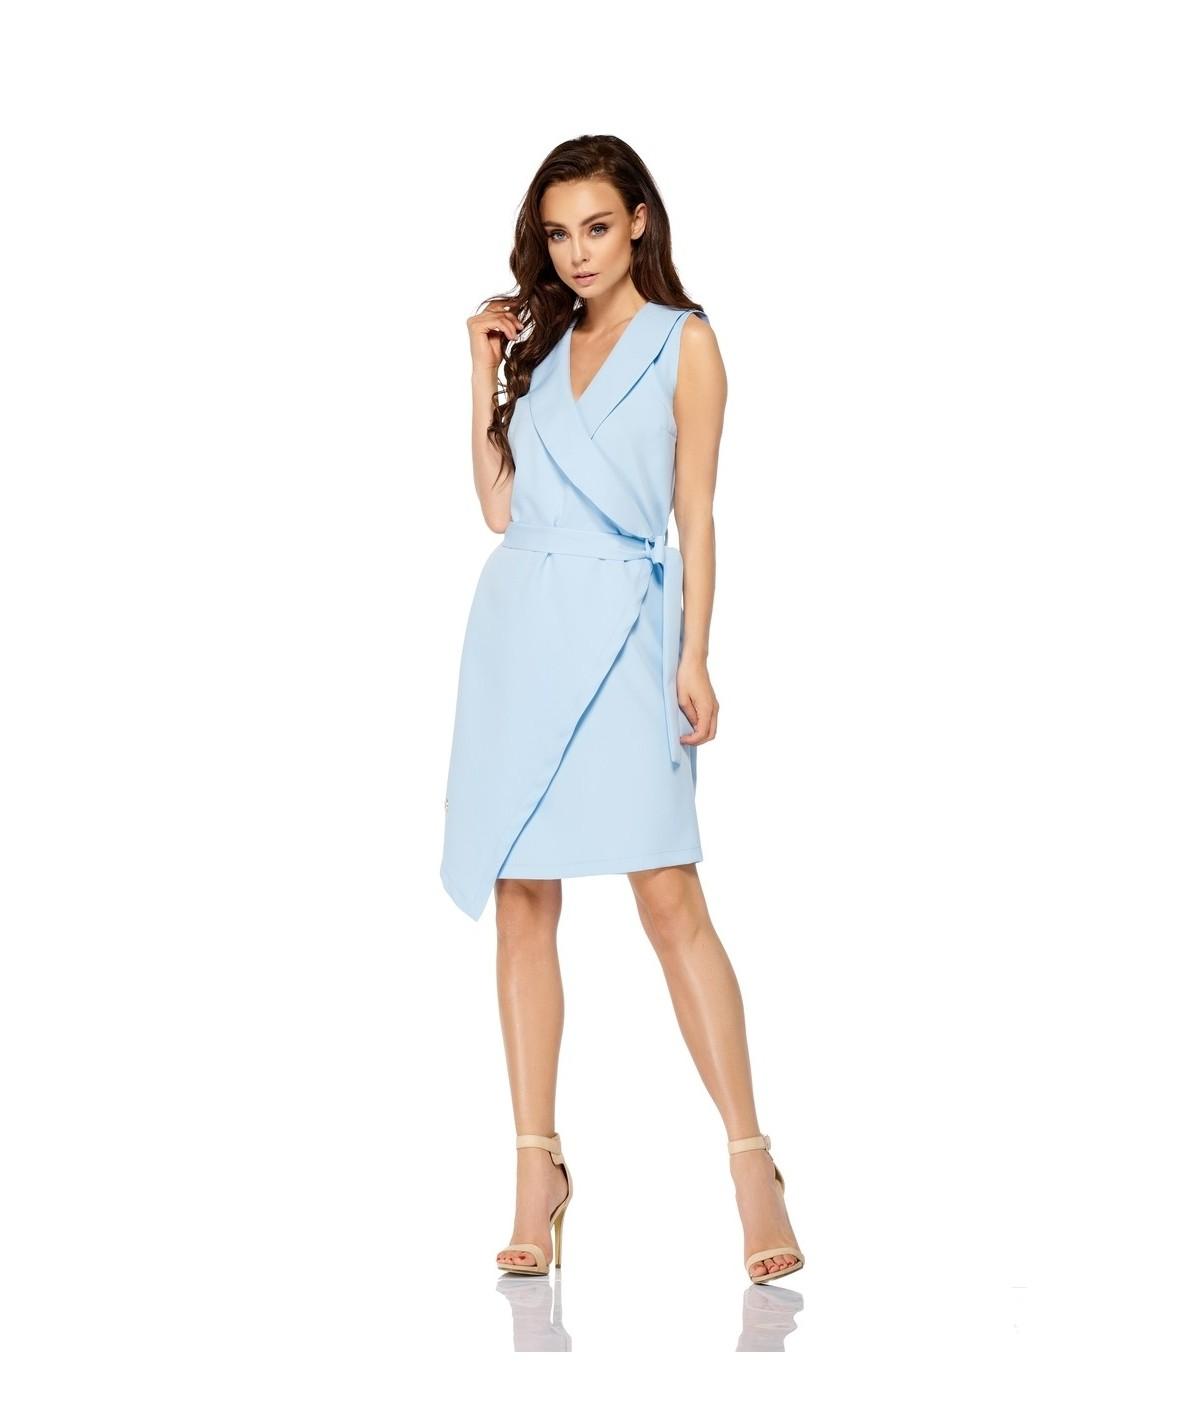 Błękitna sukienka kopertowa model L308 - lemoniade